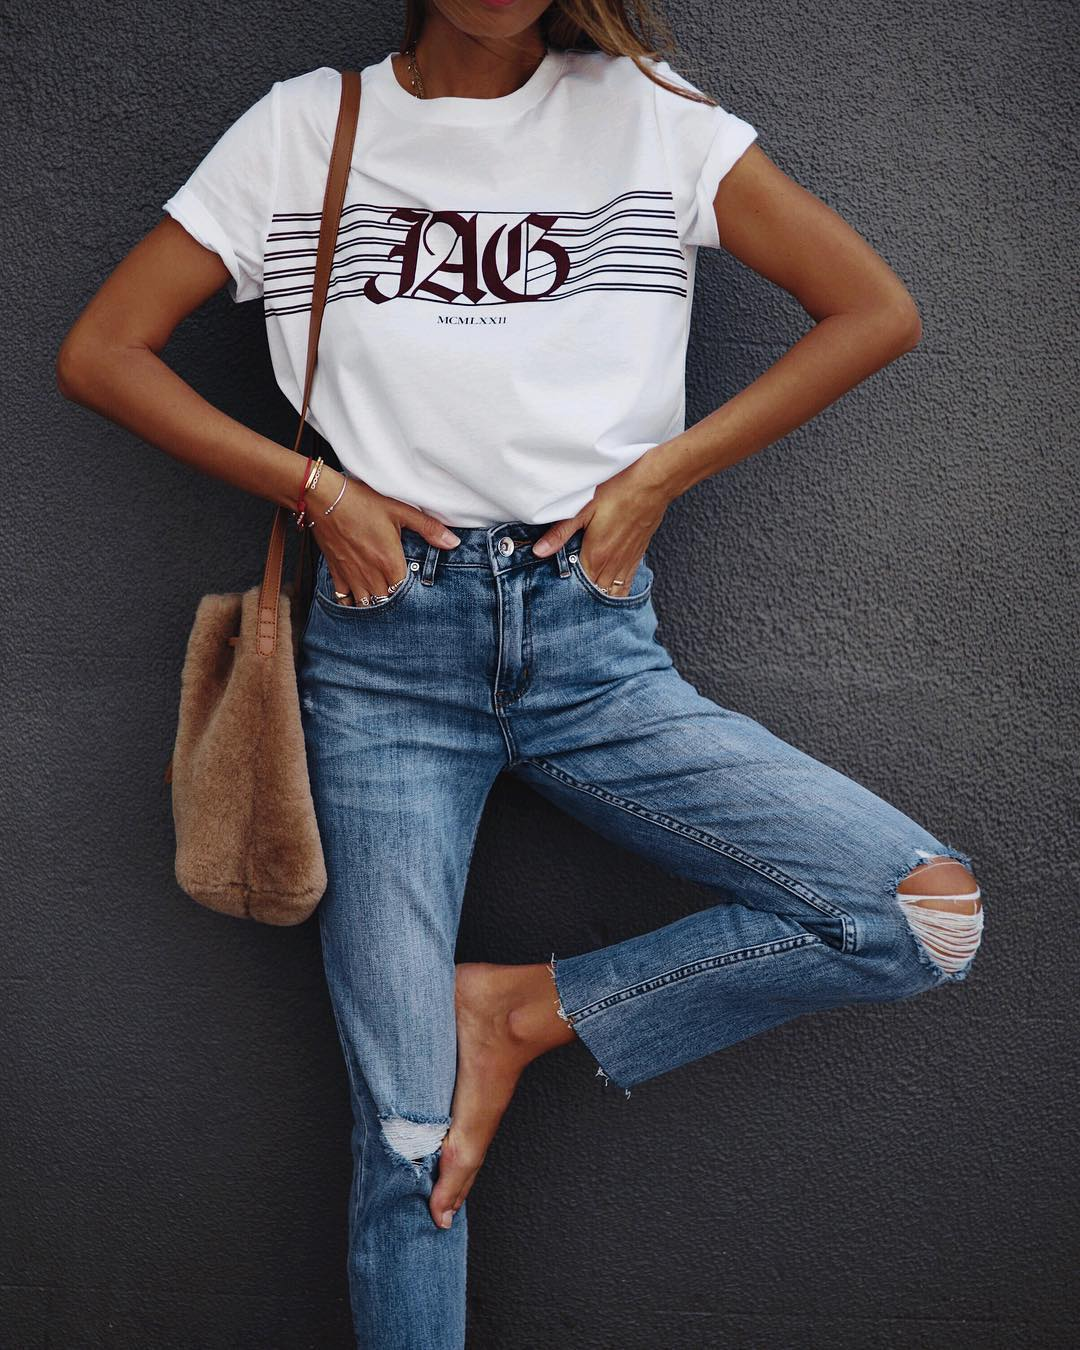 Женские футболки фото 7